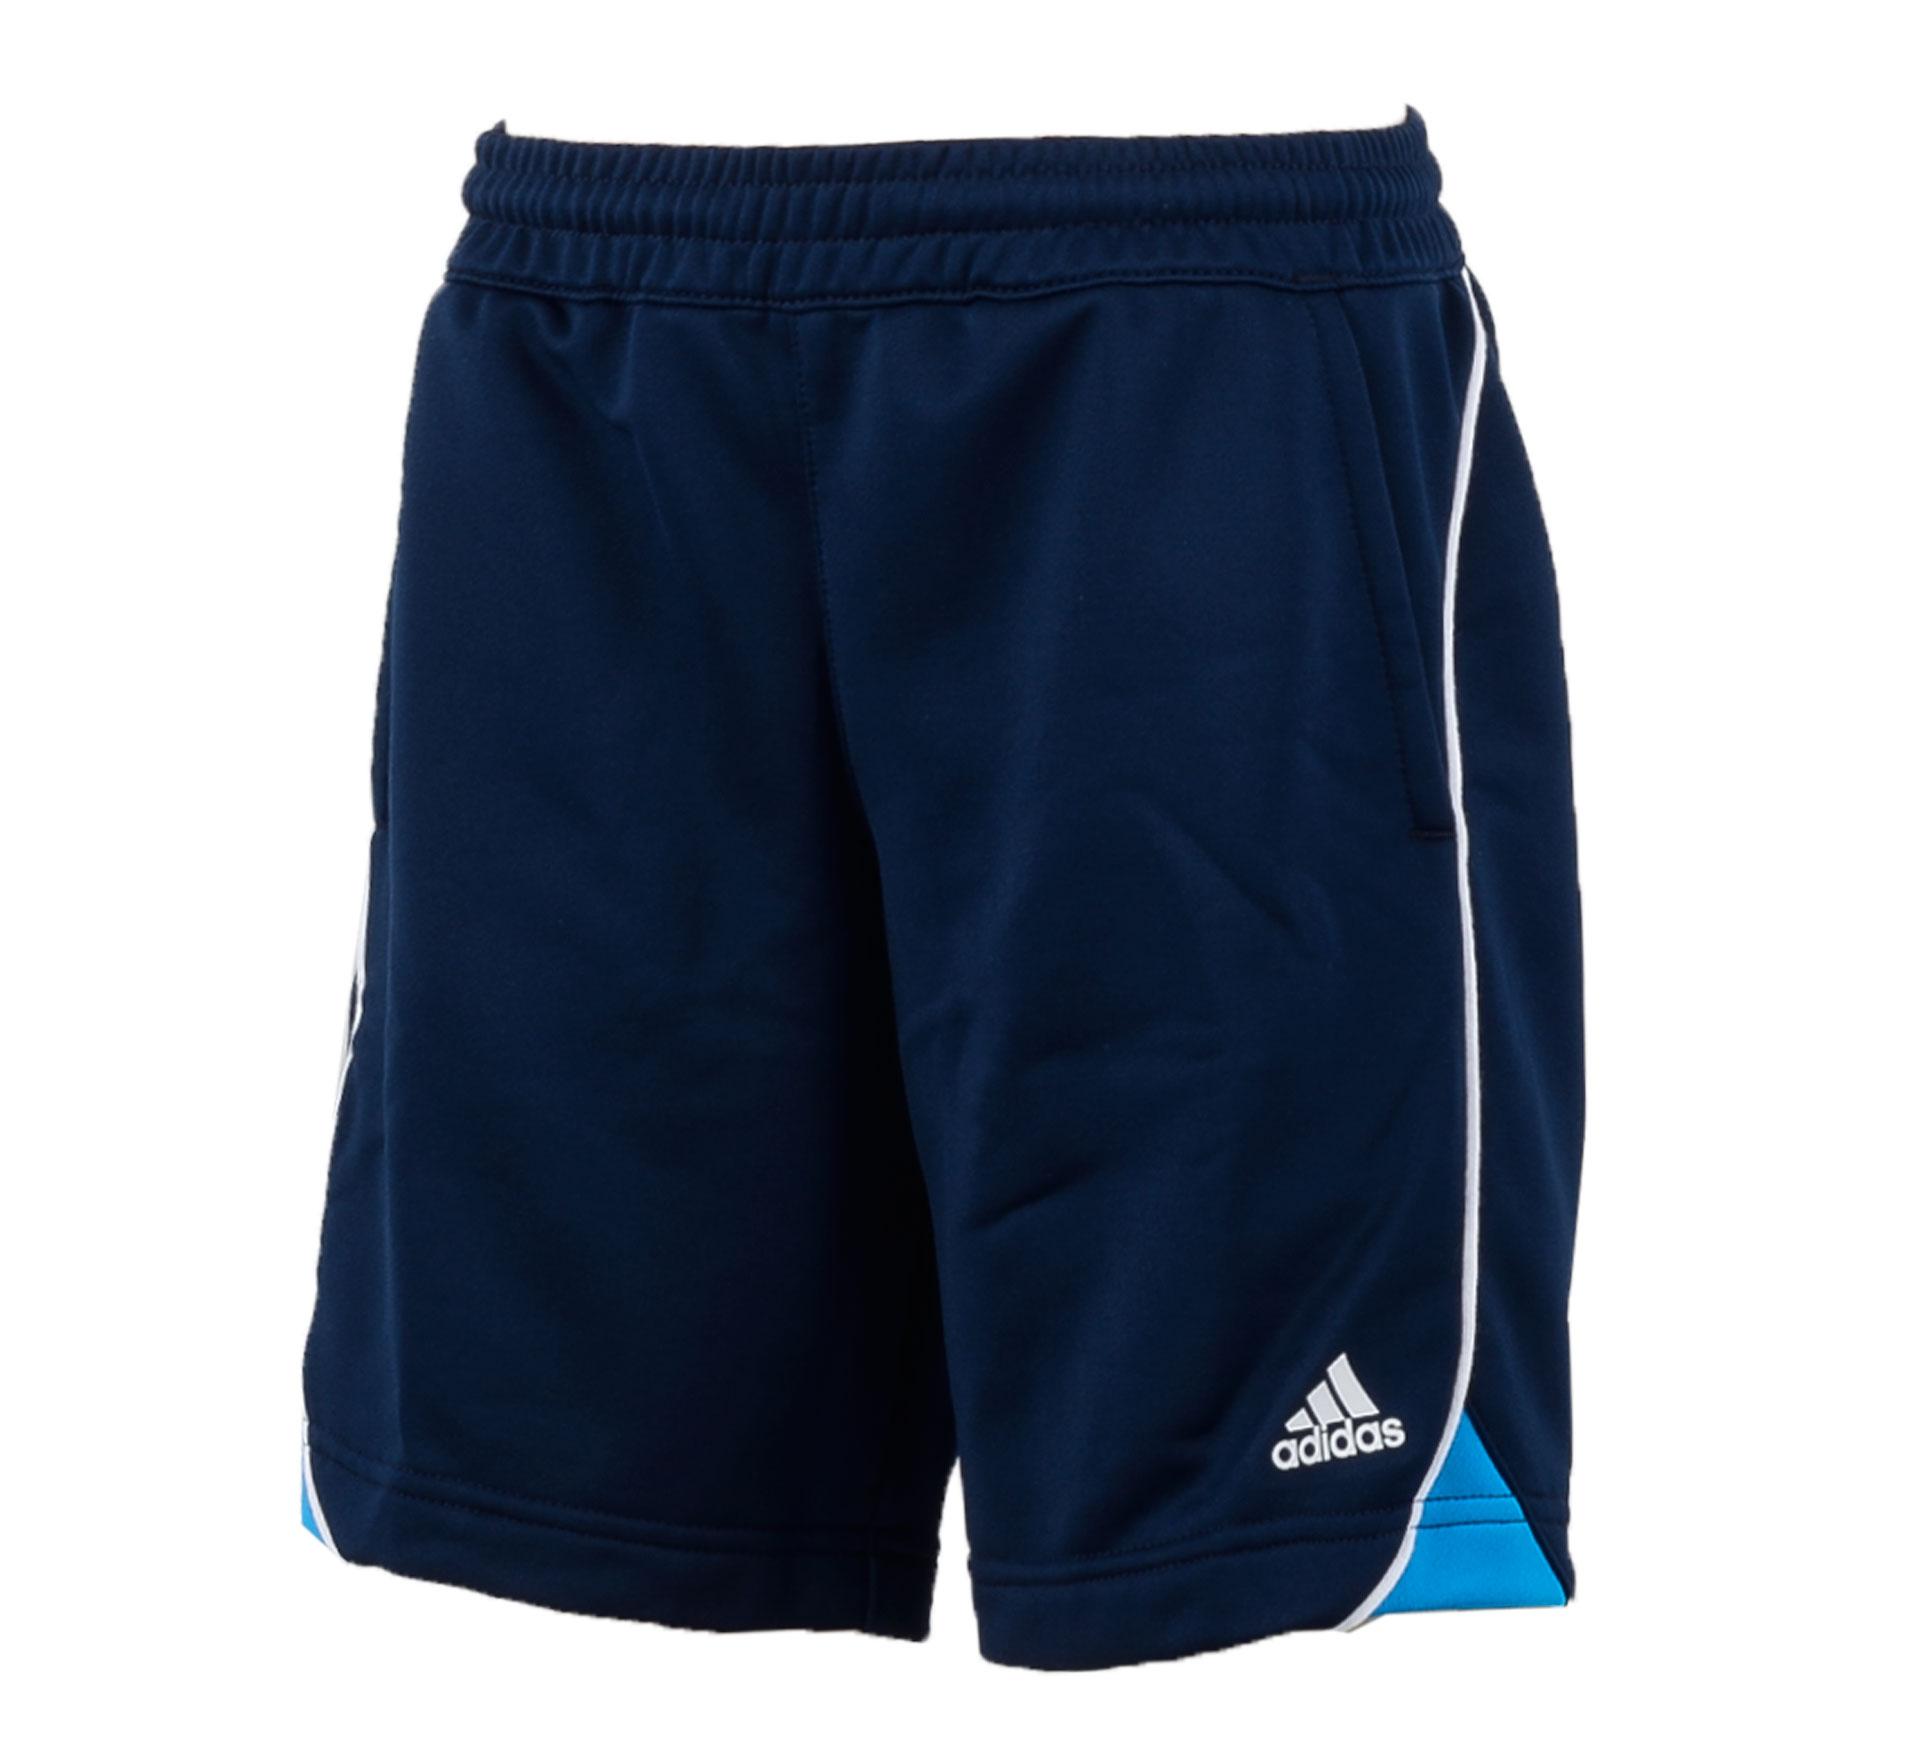 Adidas Prime Short Junior navy - blauw - wit